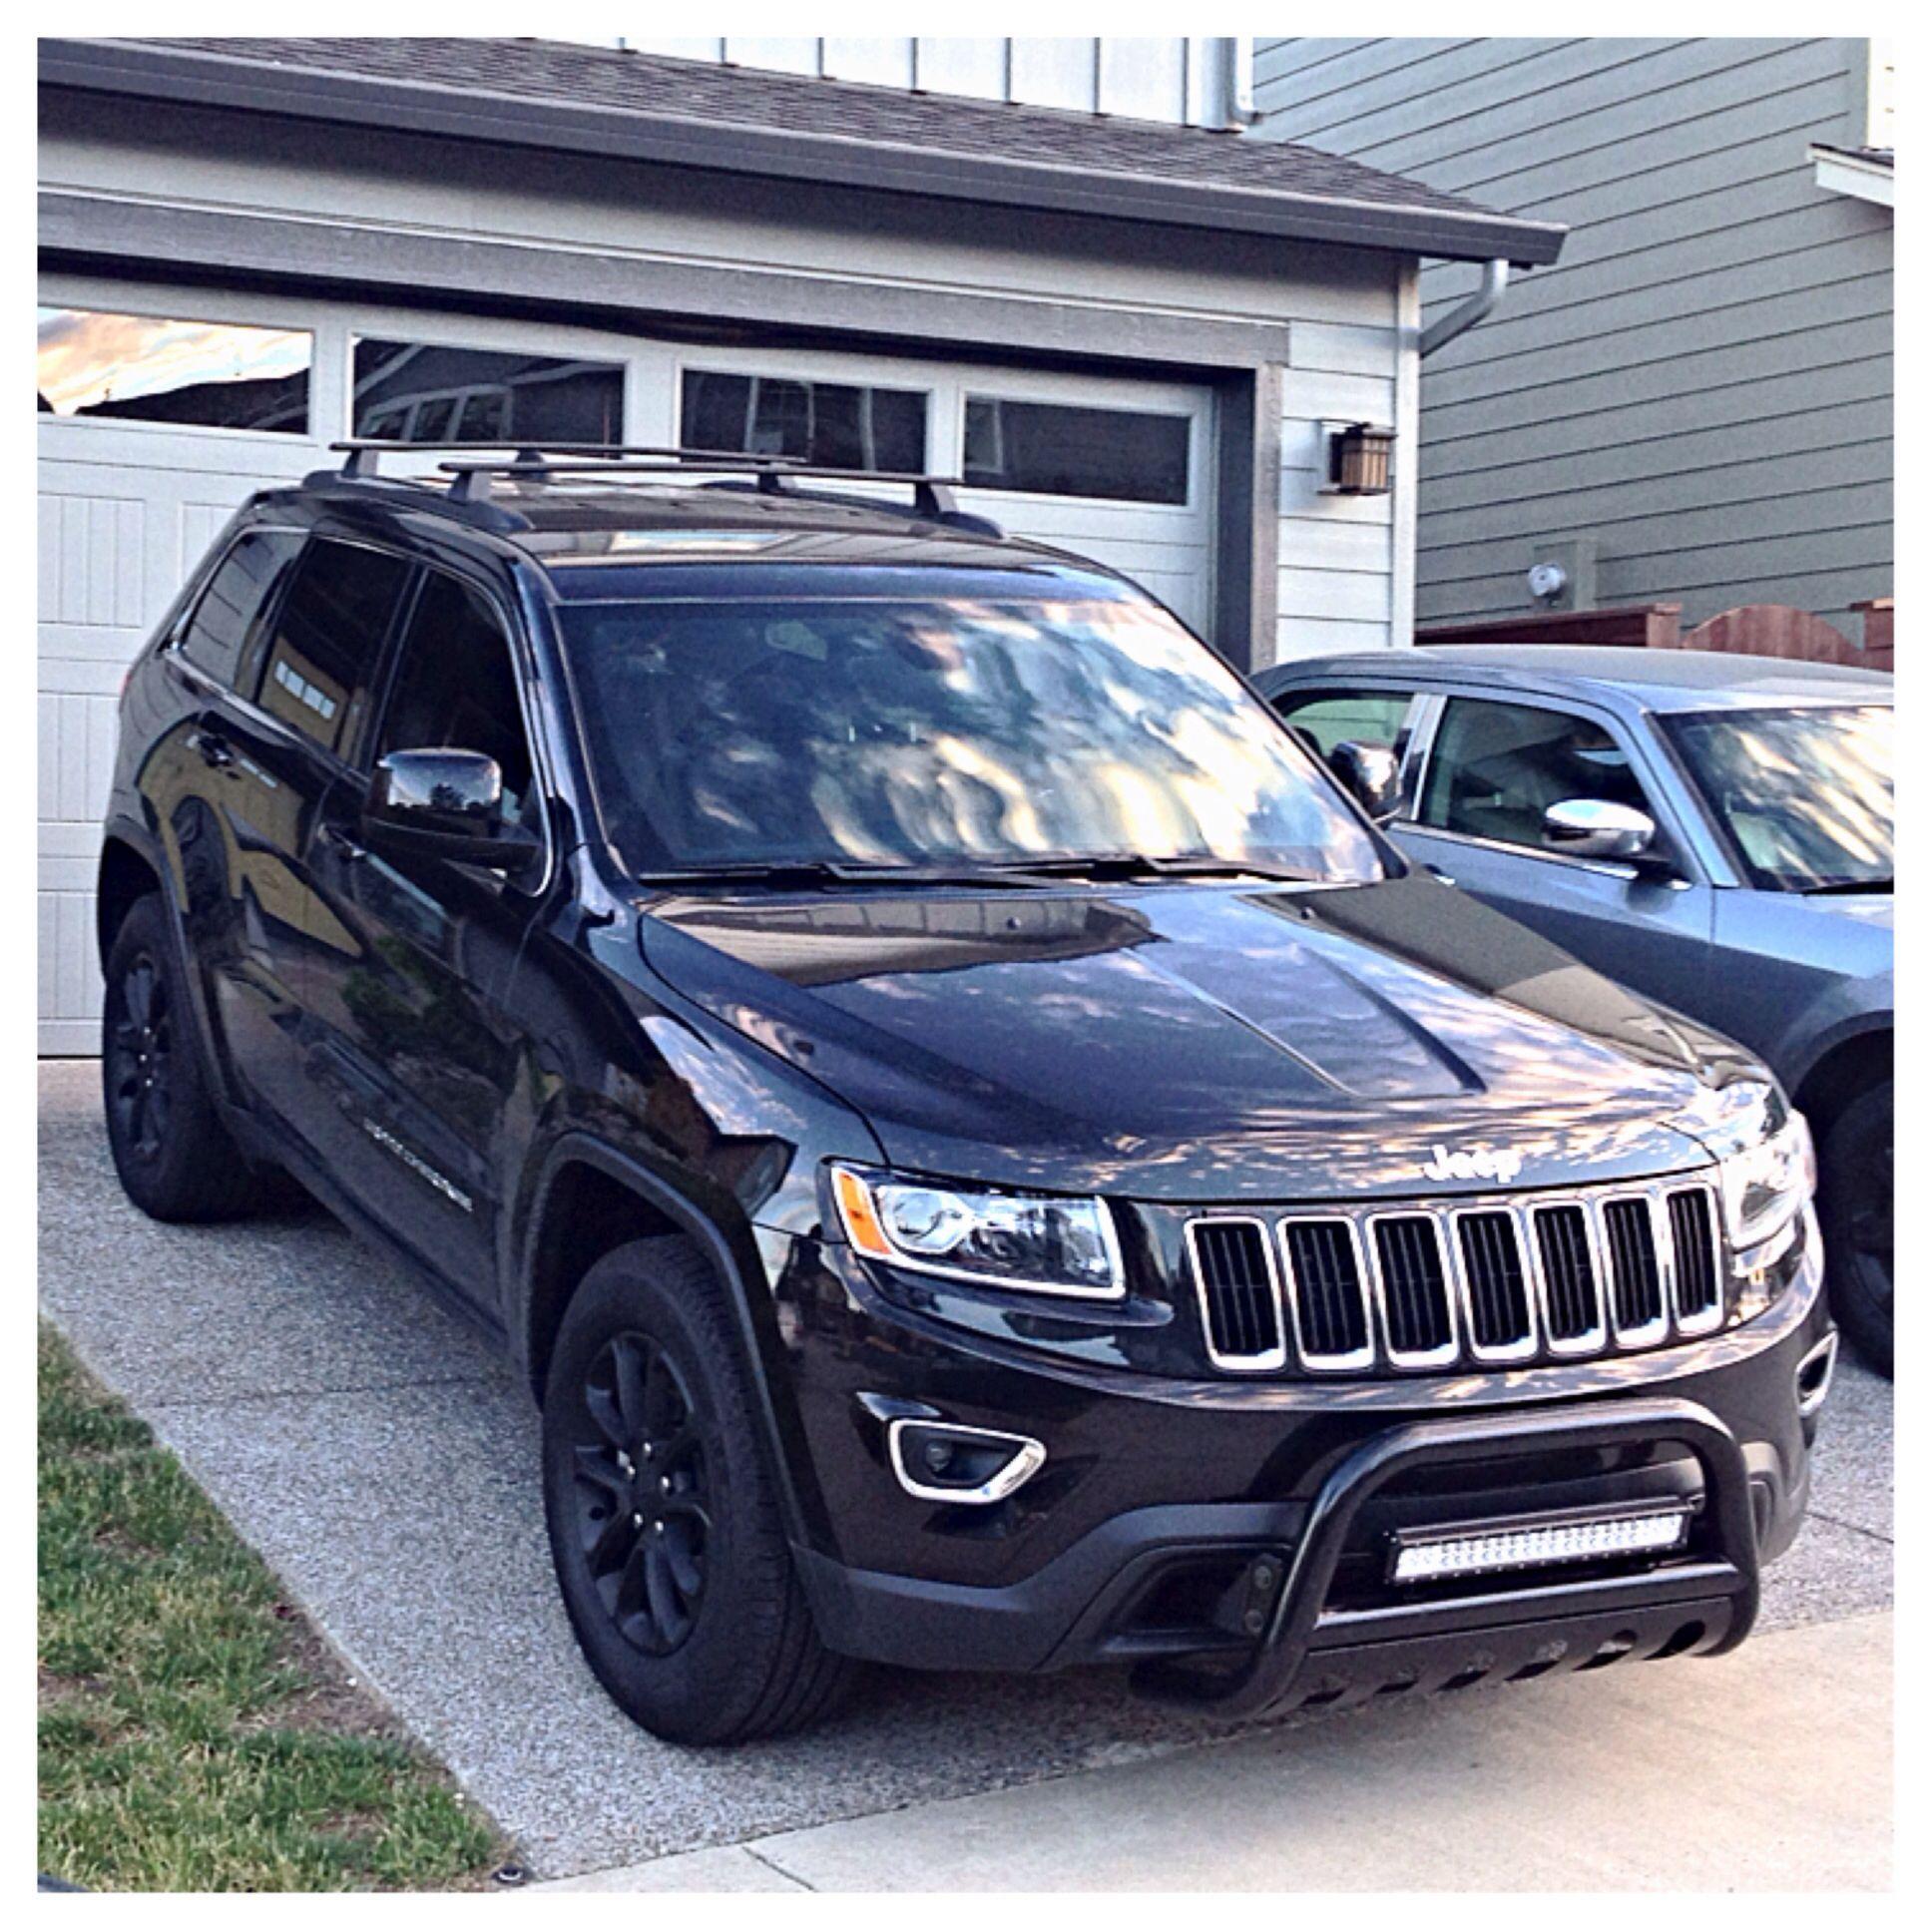 2014 Jeep Grand Cherokee Wk2 Black Plasti Dip Bull Bar Led Light